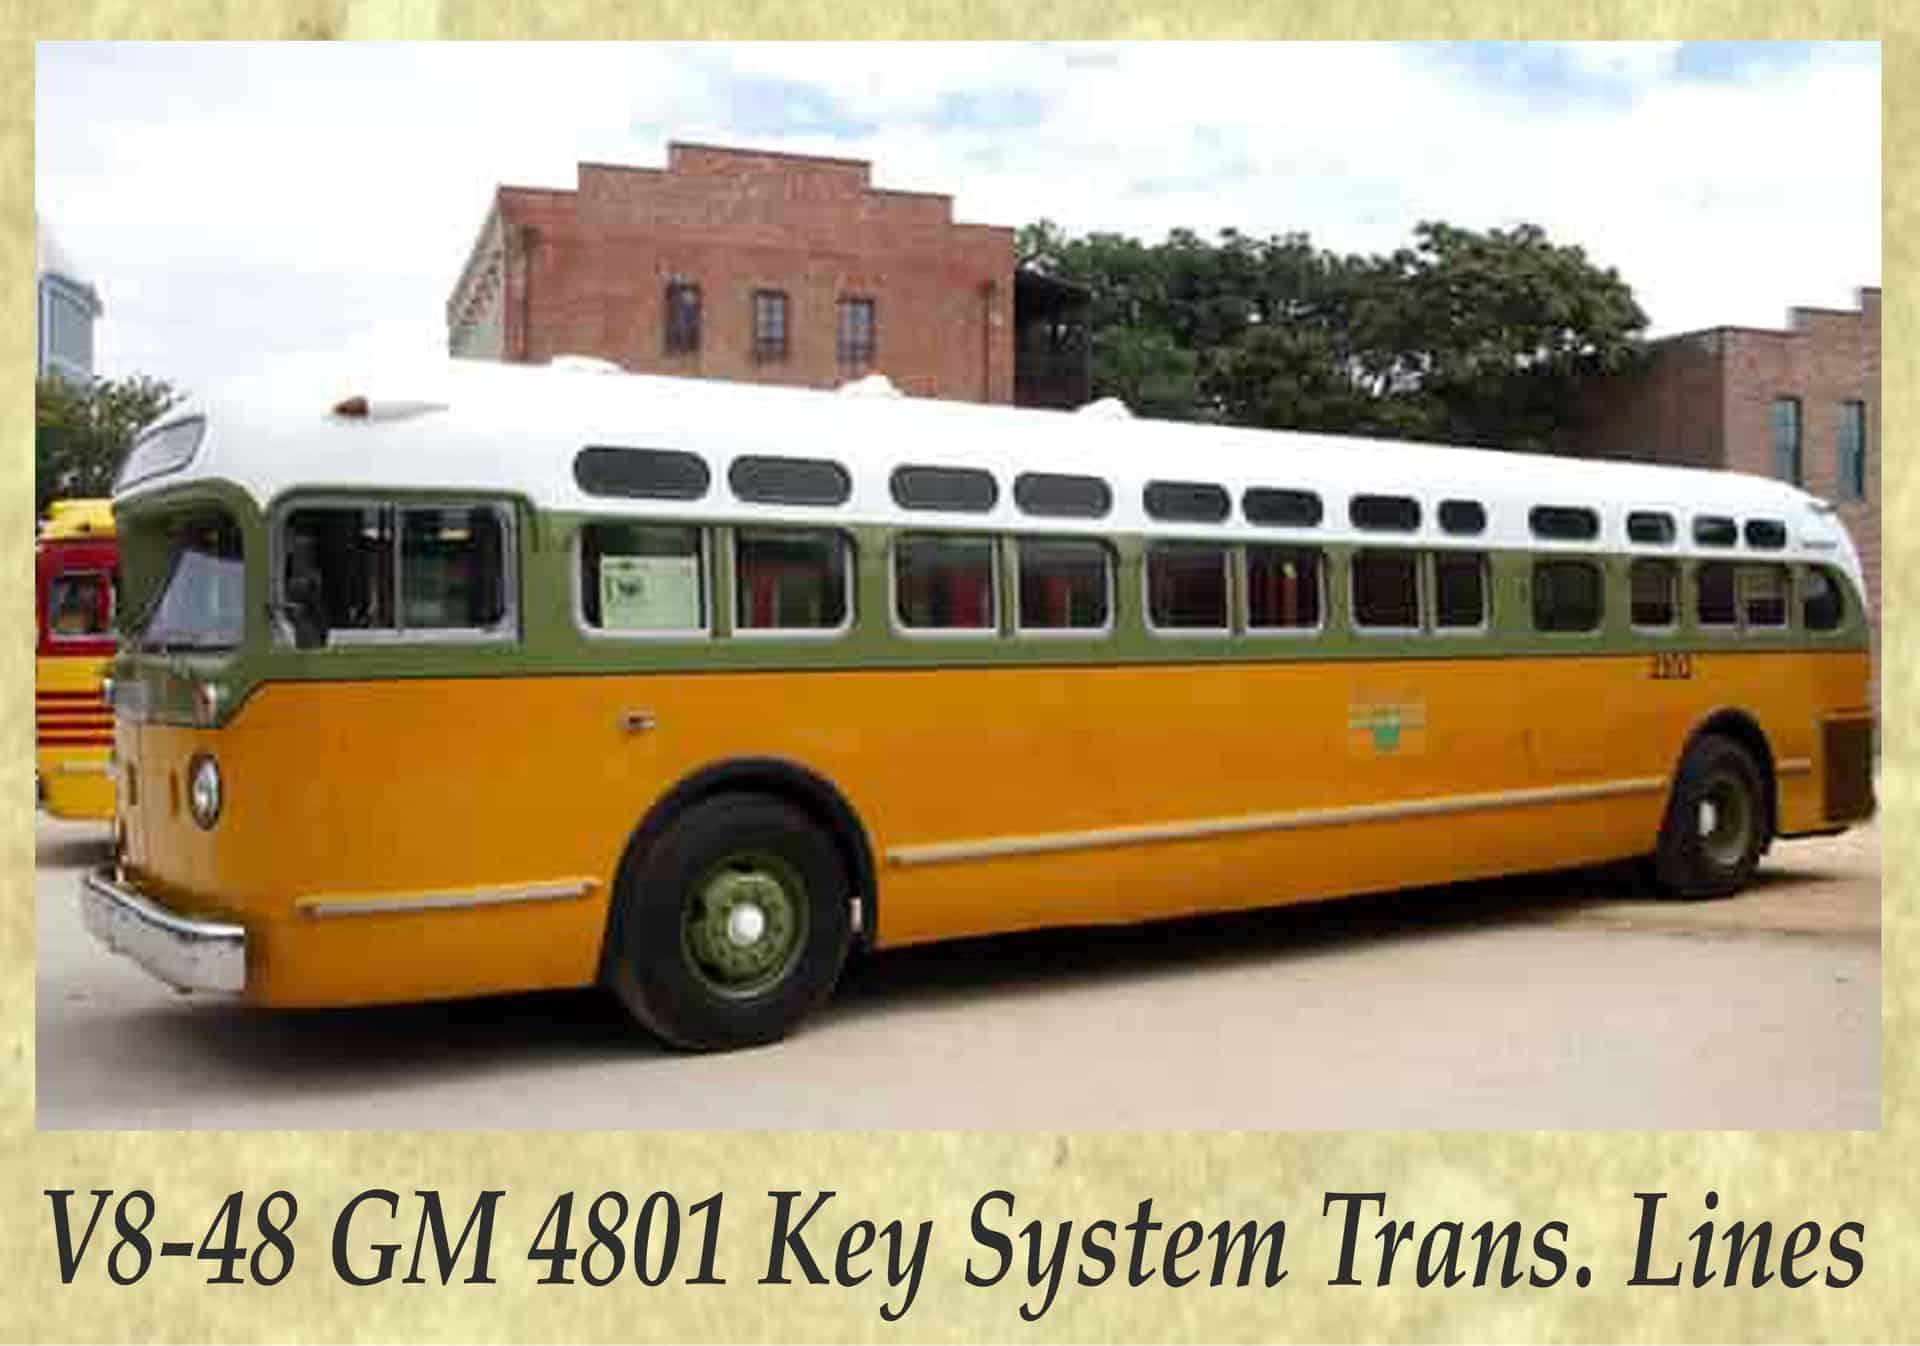 V8-48 GM 4801 Key System Trans. Lines